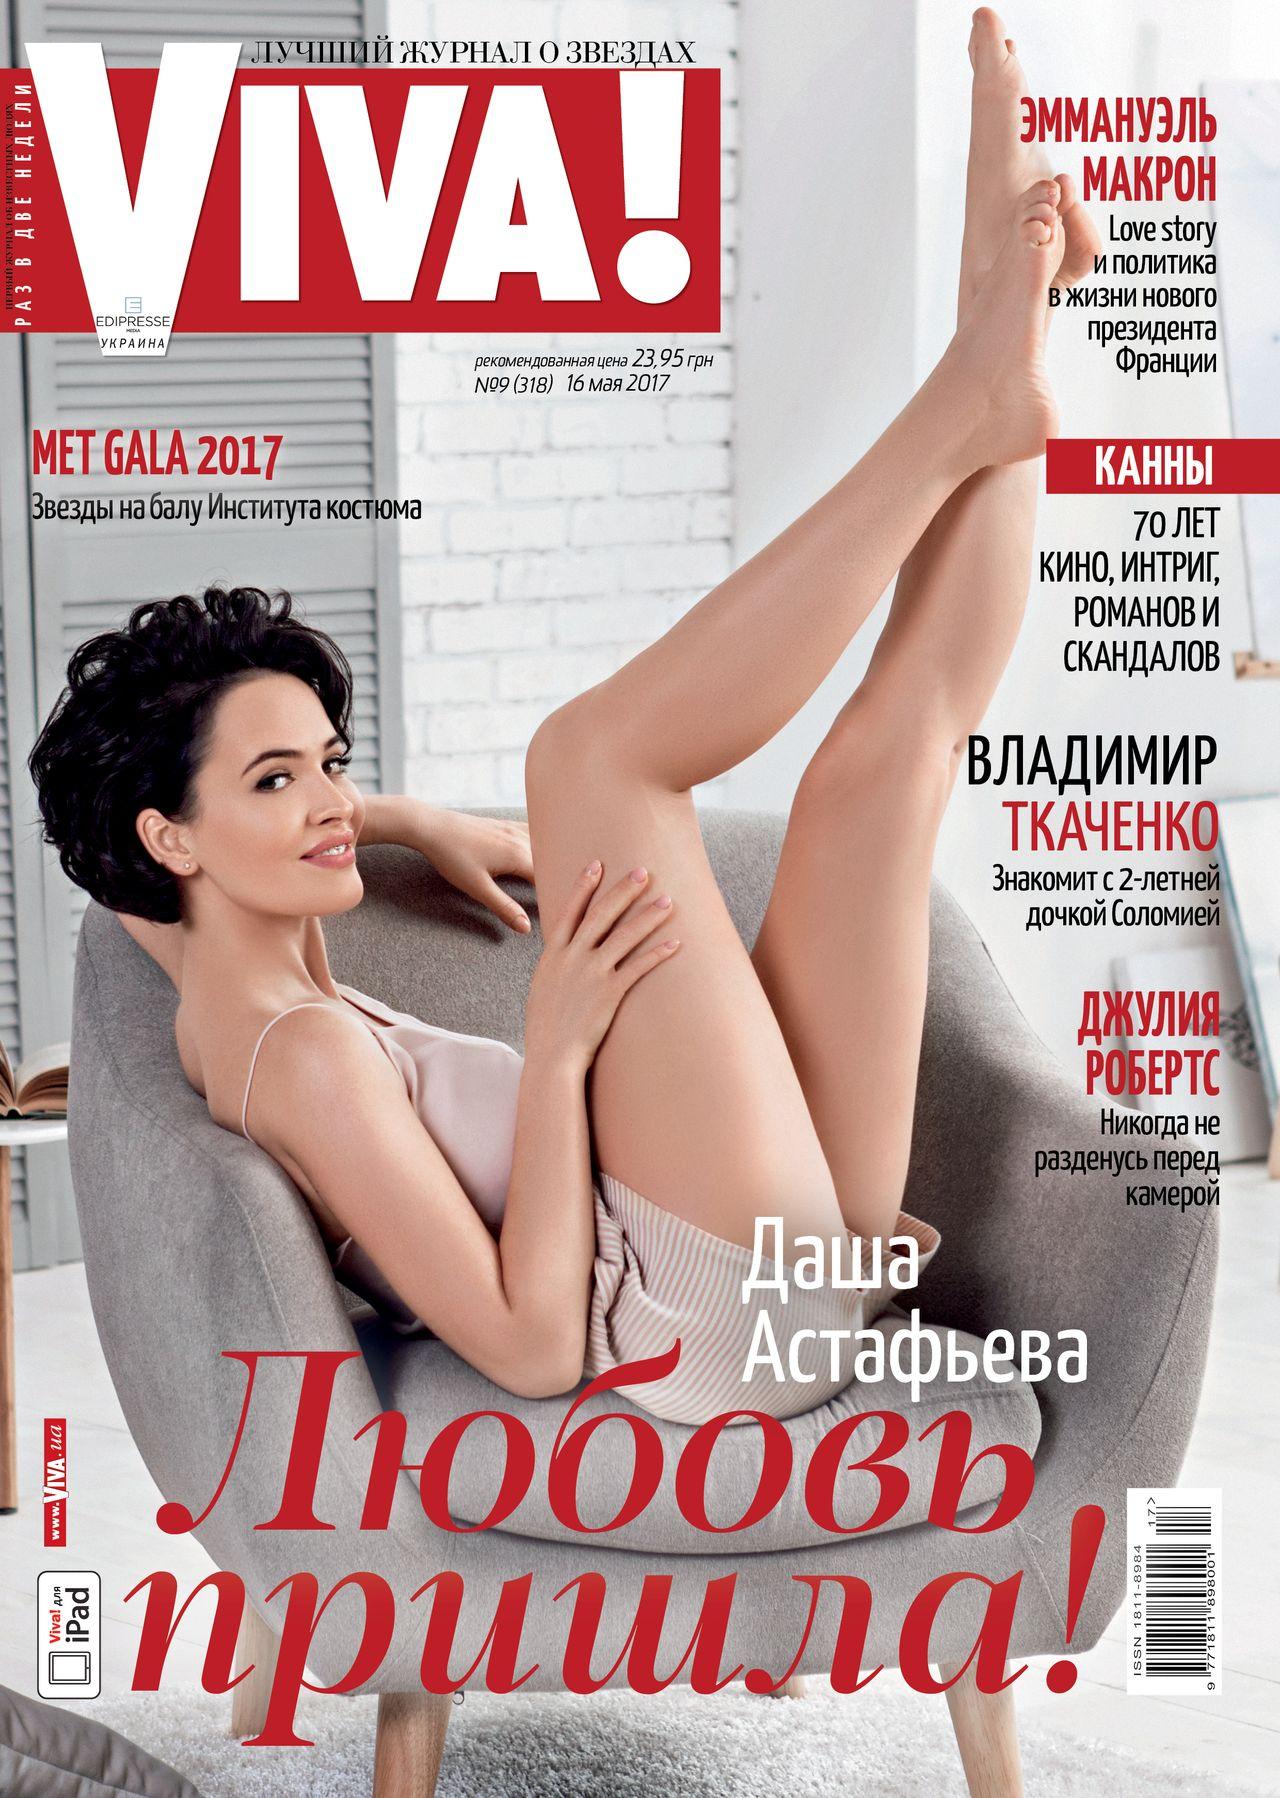 Даша Астафьева на обложке журнала Viva!